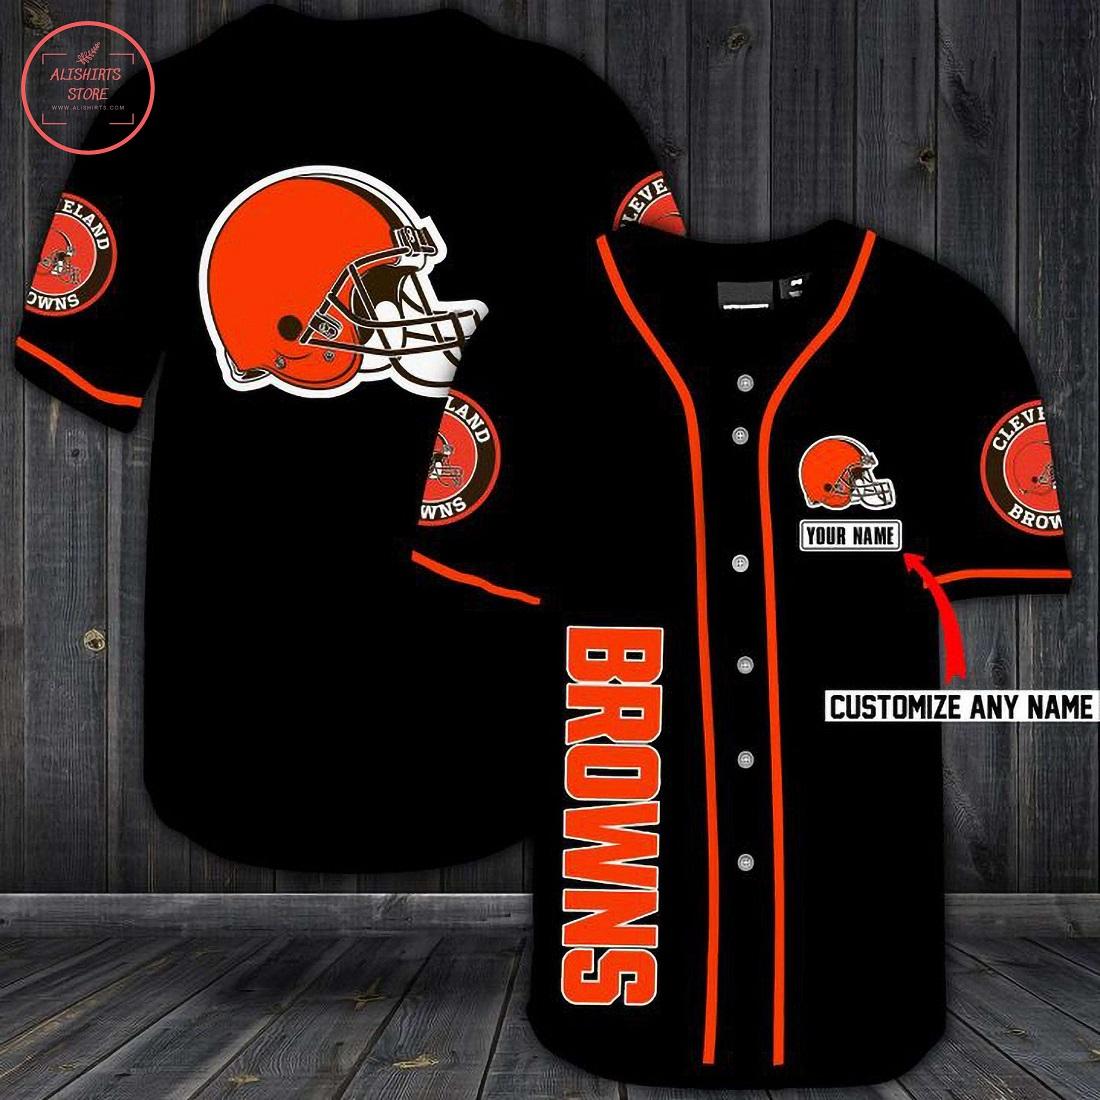 Cleveland Browns Personalized Baseball Jersey